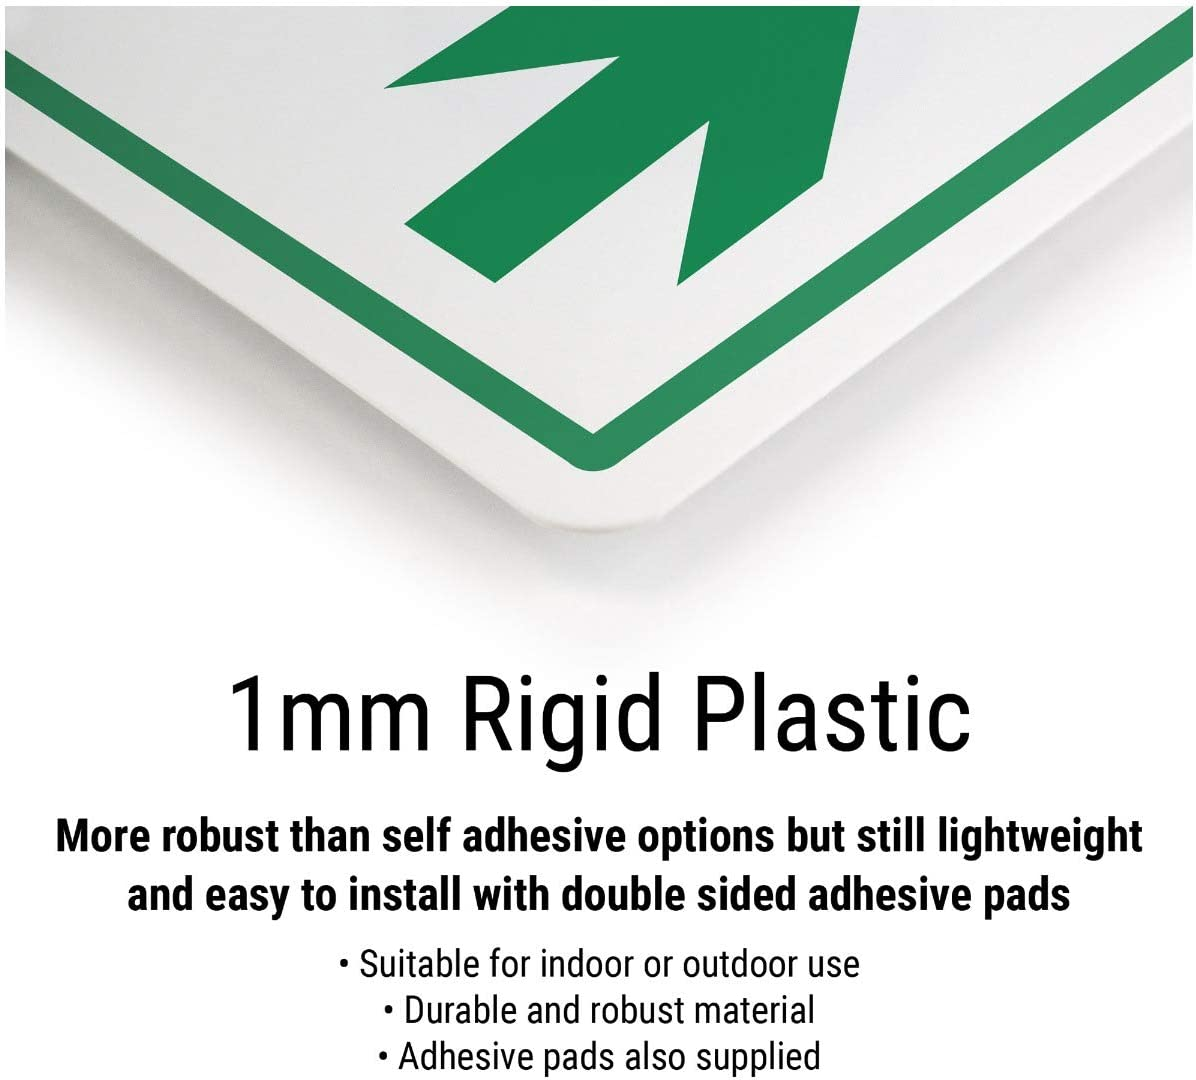 Vsafety COVID-Secure Workplace 1mm Rigid Plastic 300mm x 400mm